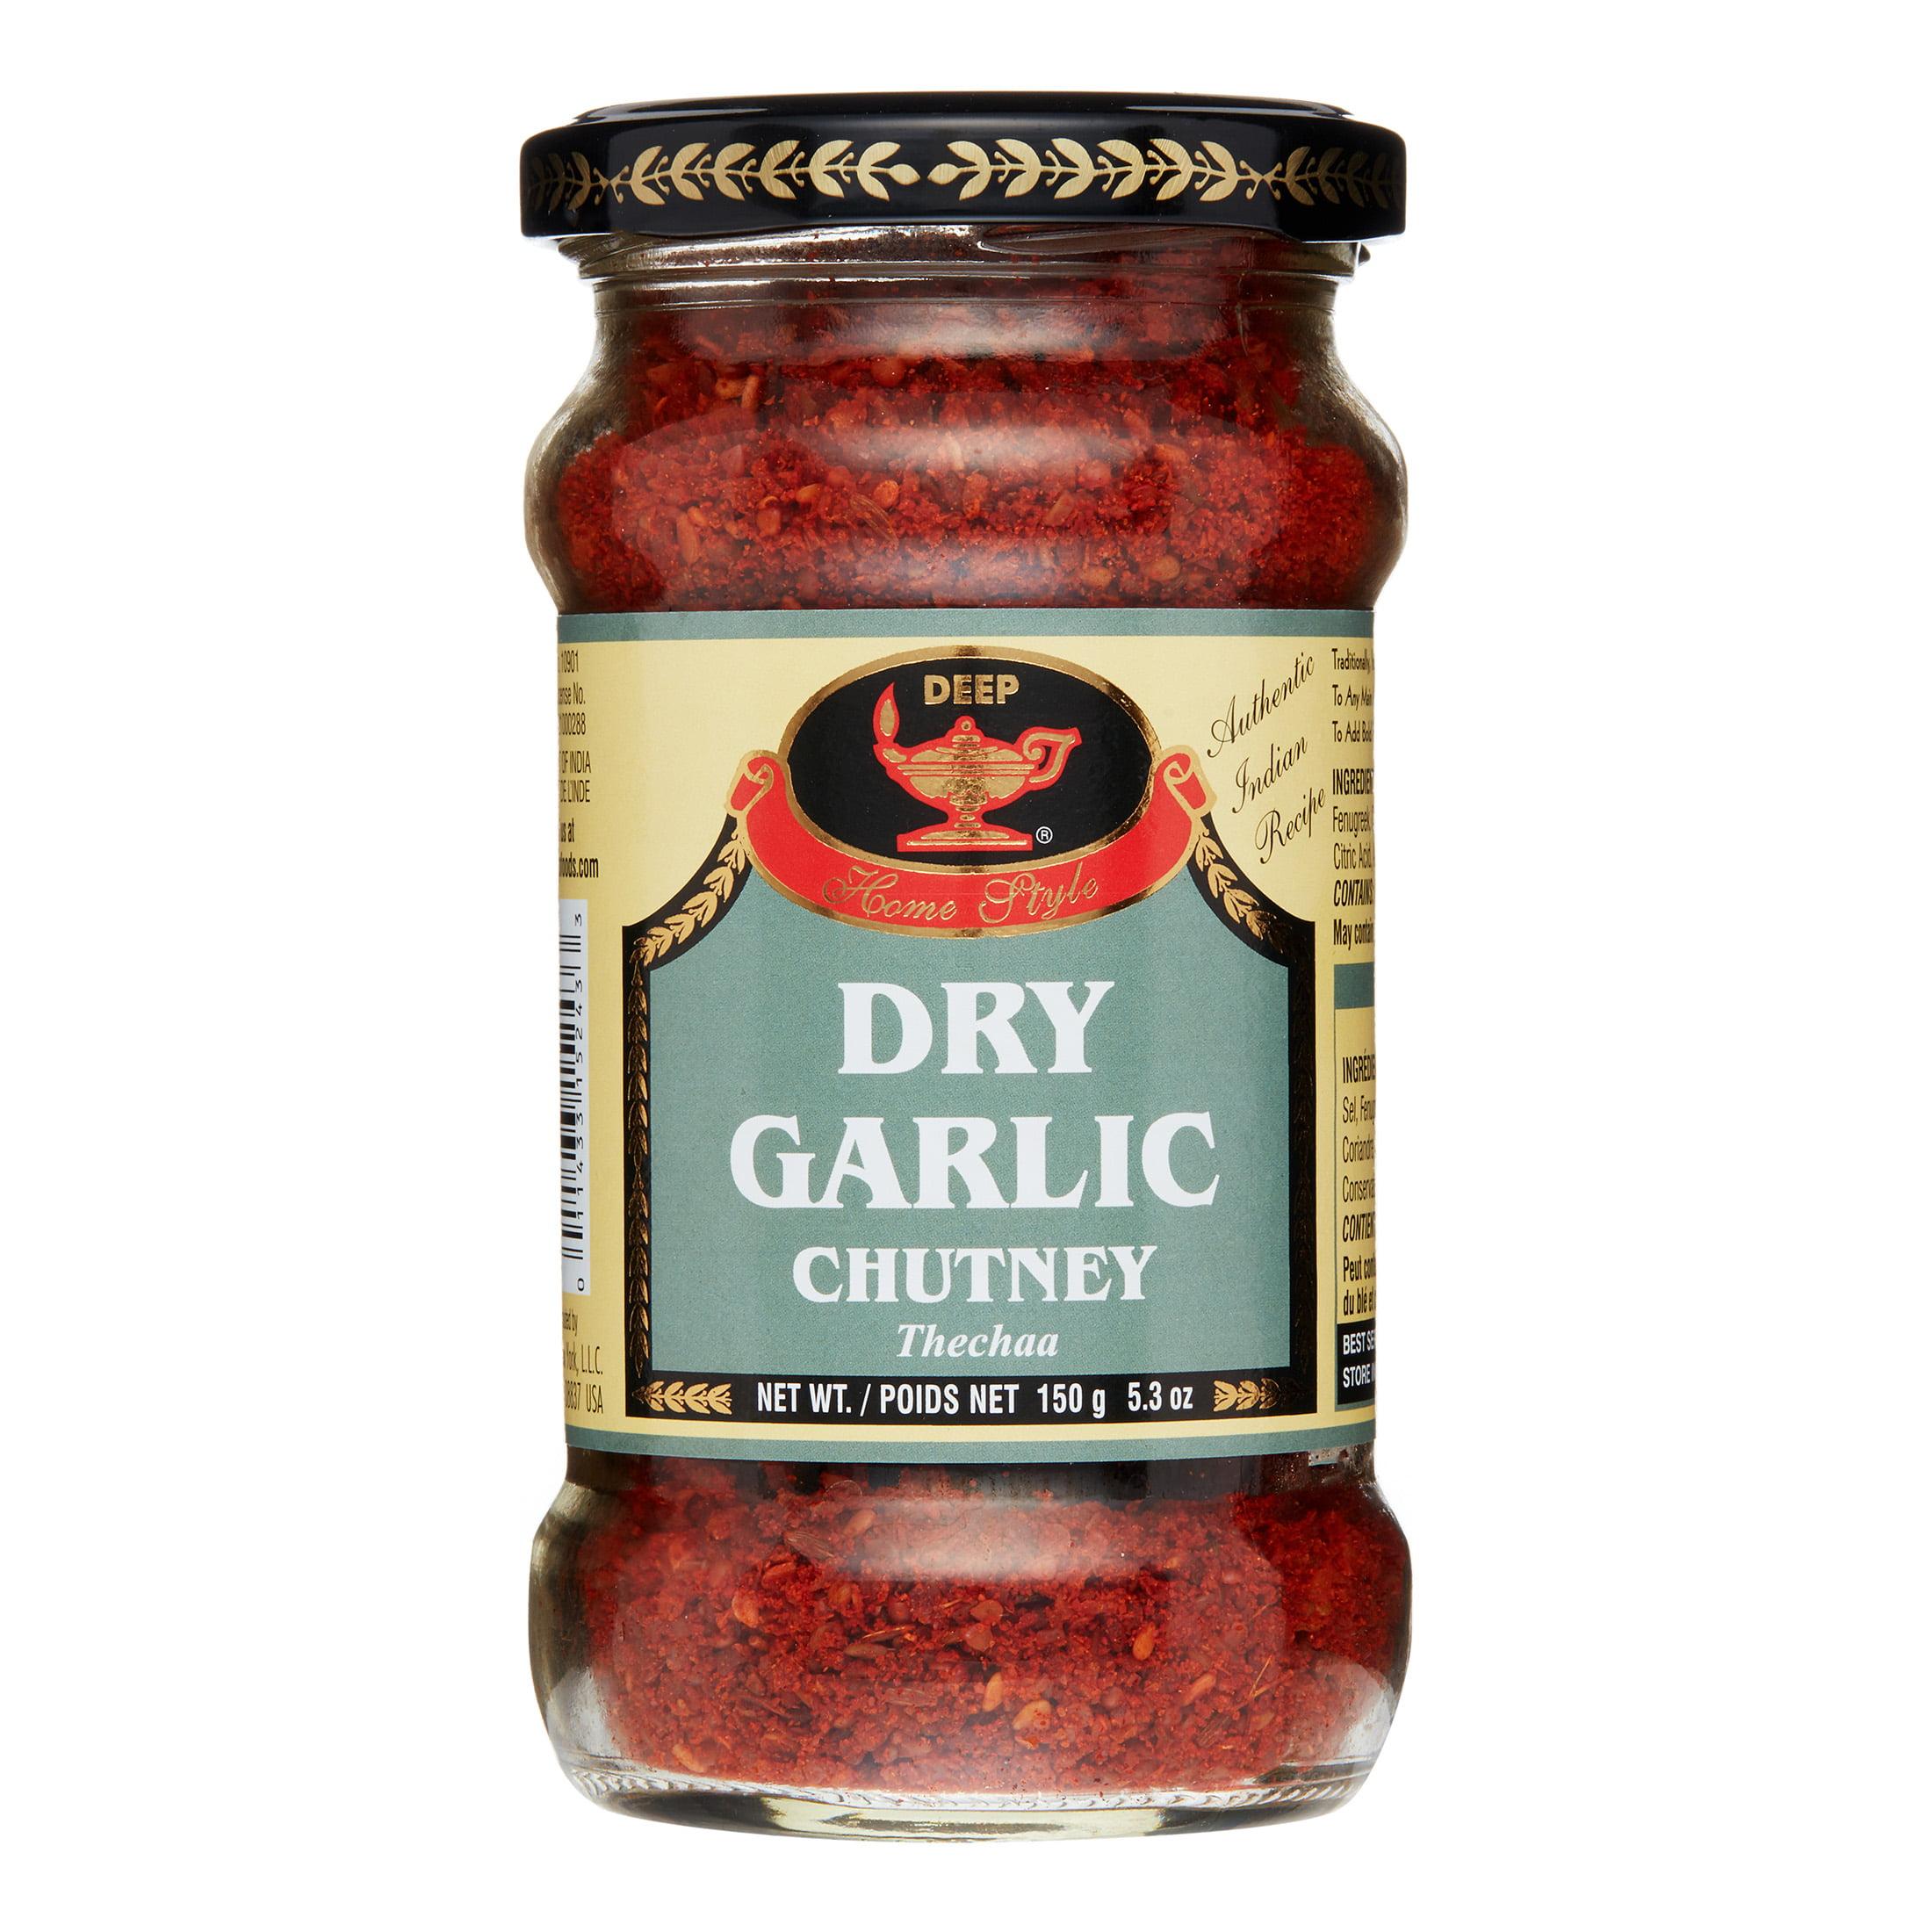 Deep Dry Garlic Chutney, 5.3 Oz by Chetak New York LLC